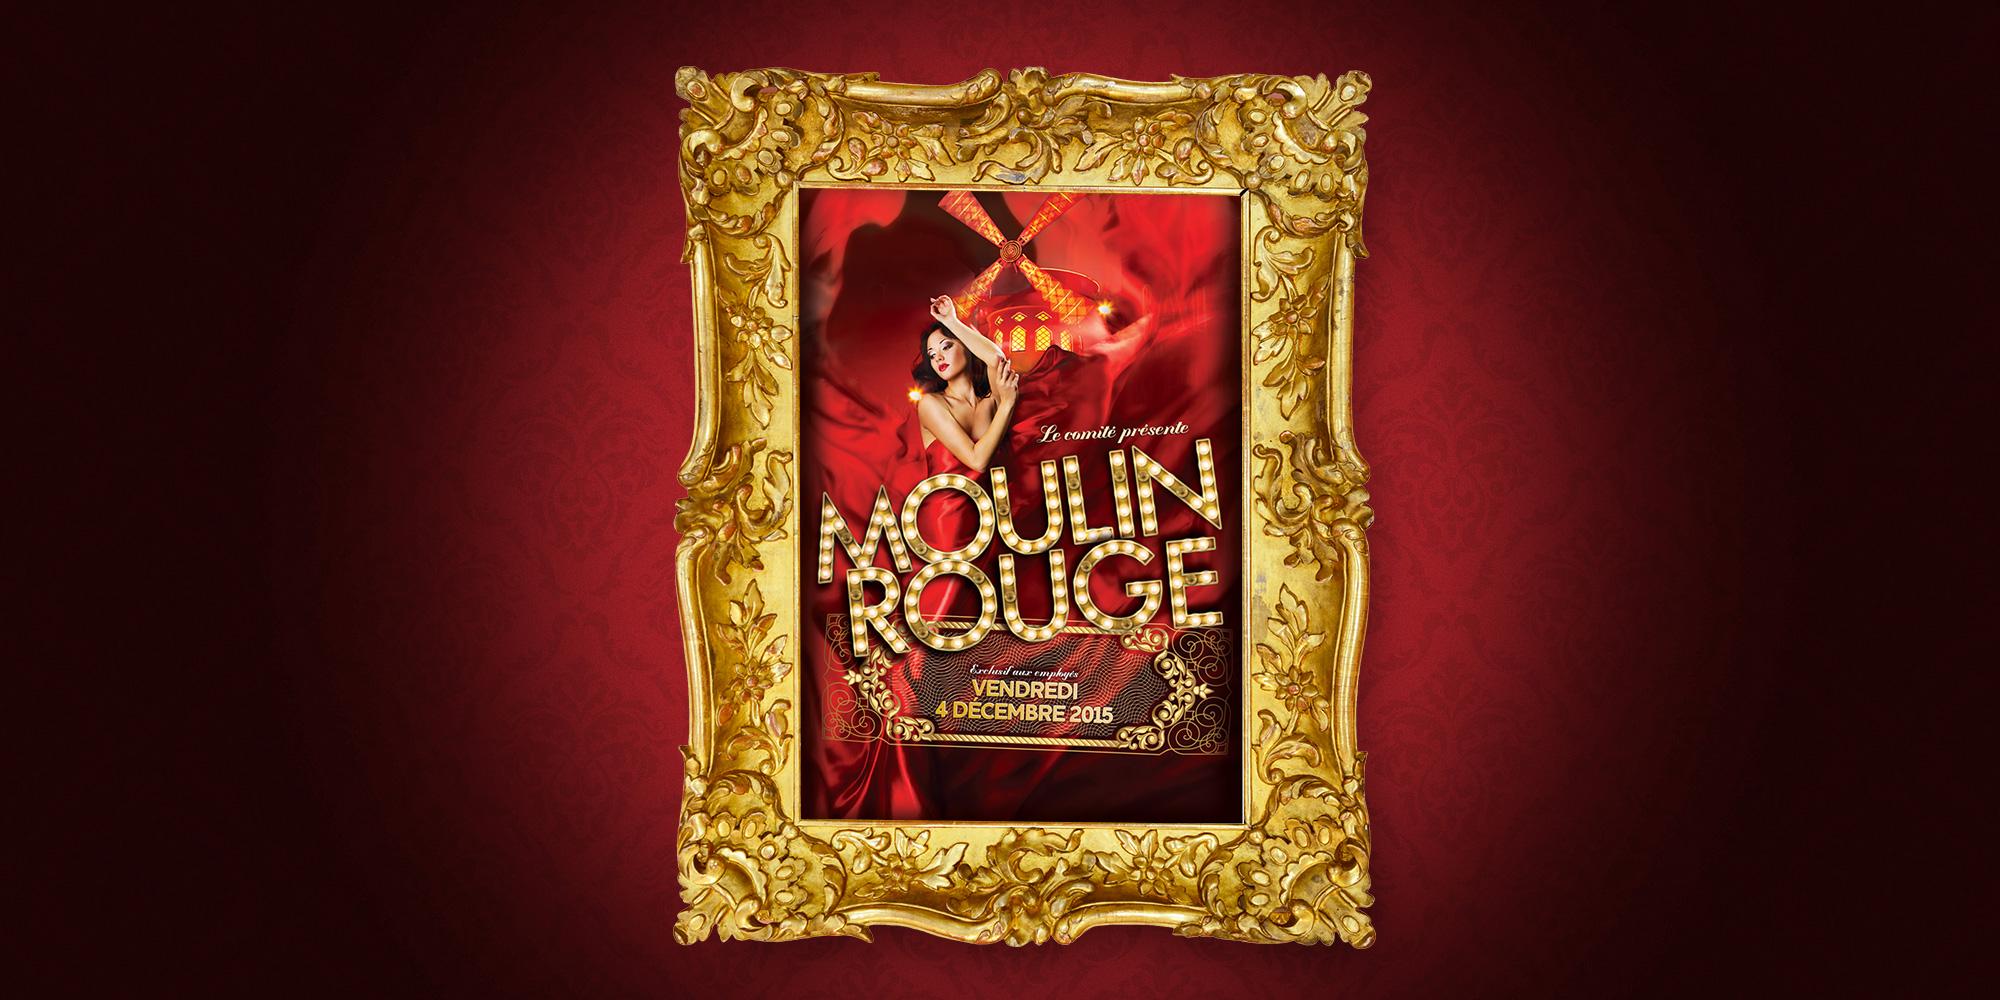 Voyou Goes Burlesque!